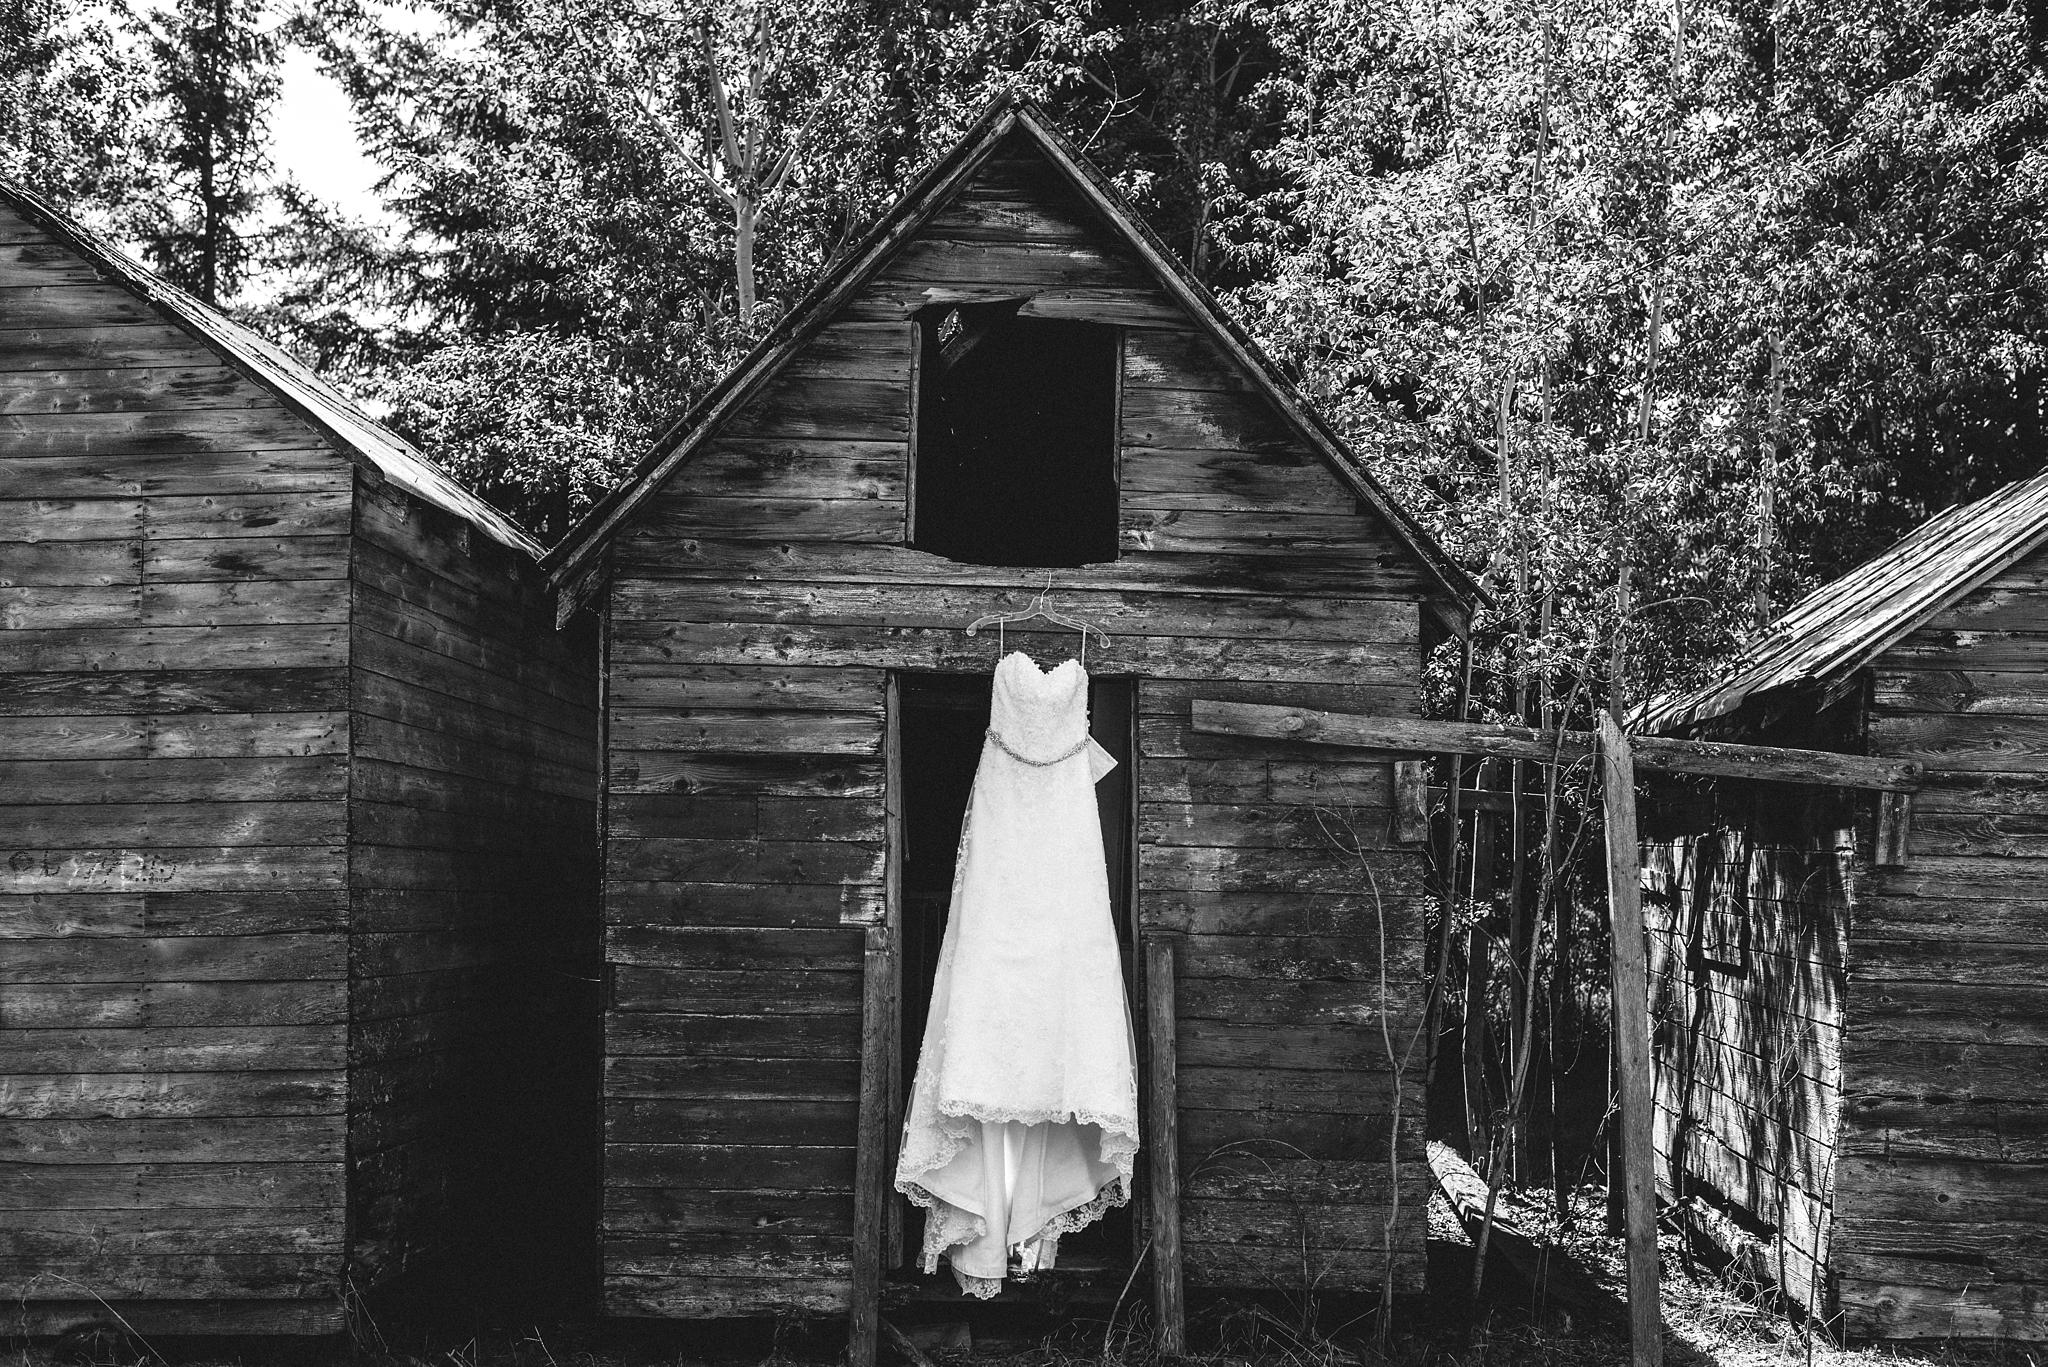 kaihla_tonai_intimate_wedding_elopement_photographer_1500